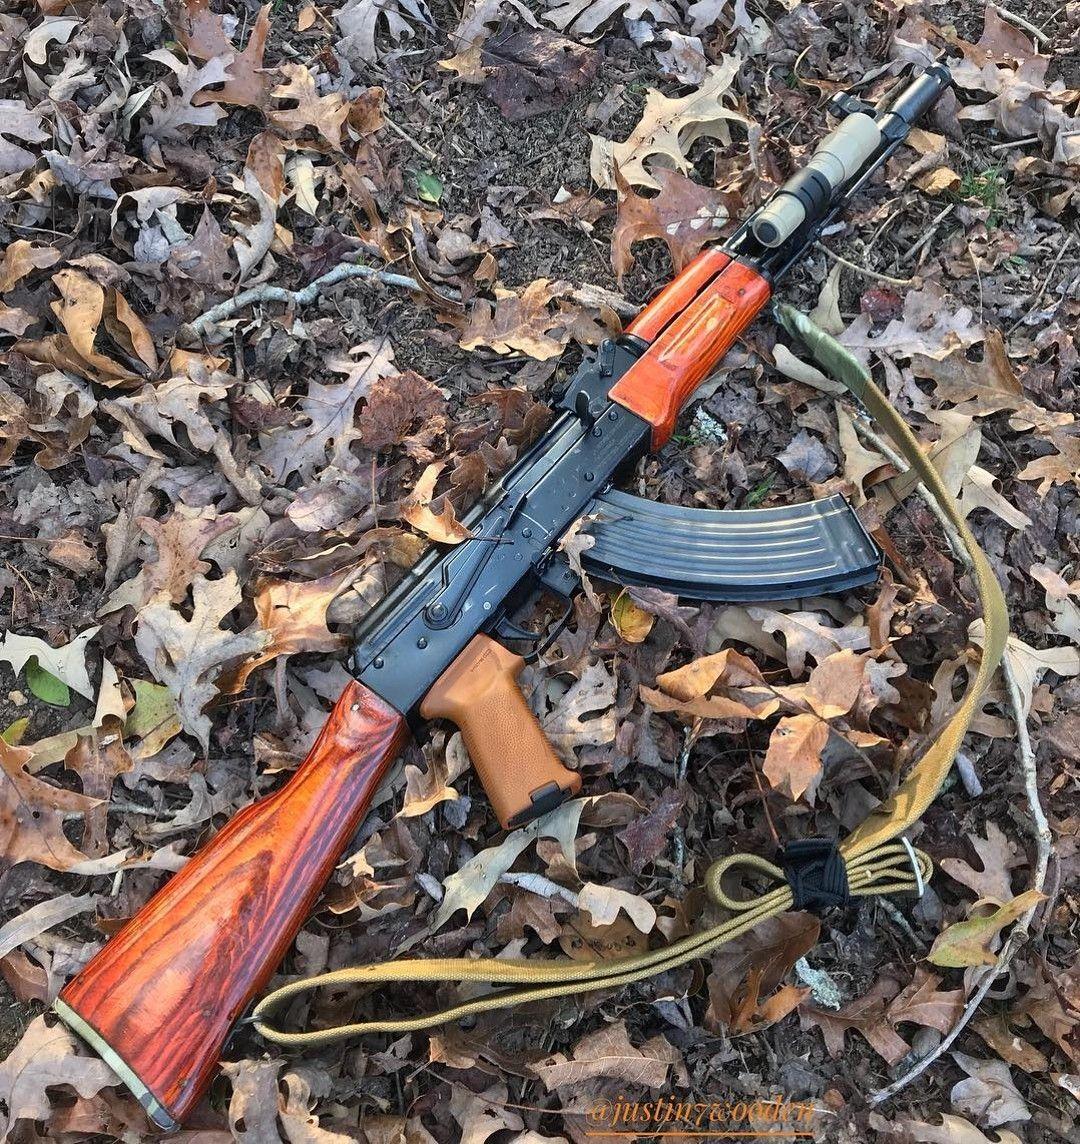 Don't forget to prepare your #AK for the autumn.🙂  #ak #ak47 #slr #ak74 #kalashnikov #kalashworld #avtomat #kalash_wood #gotwood #mags #steel #762 #ammo #weaponslife #firearms #instagun #gunz #gunsofinsta #3guns #545 #grips #pewpewlife  Credit to @justin7wooden